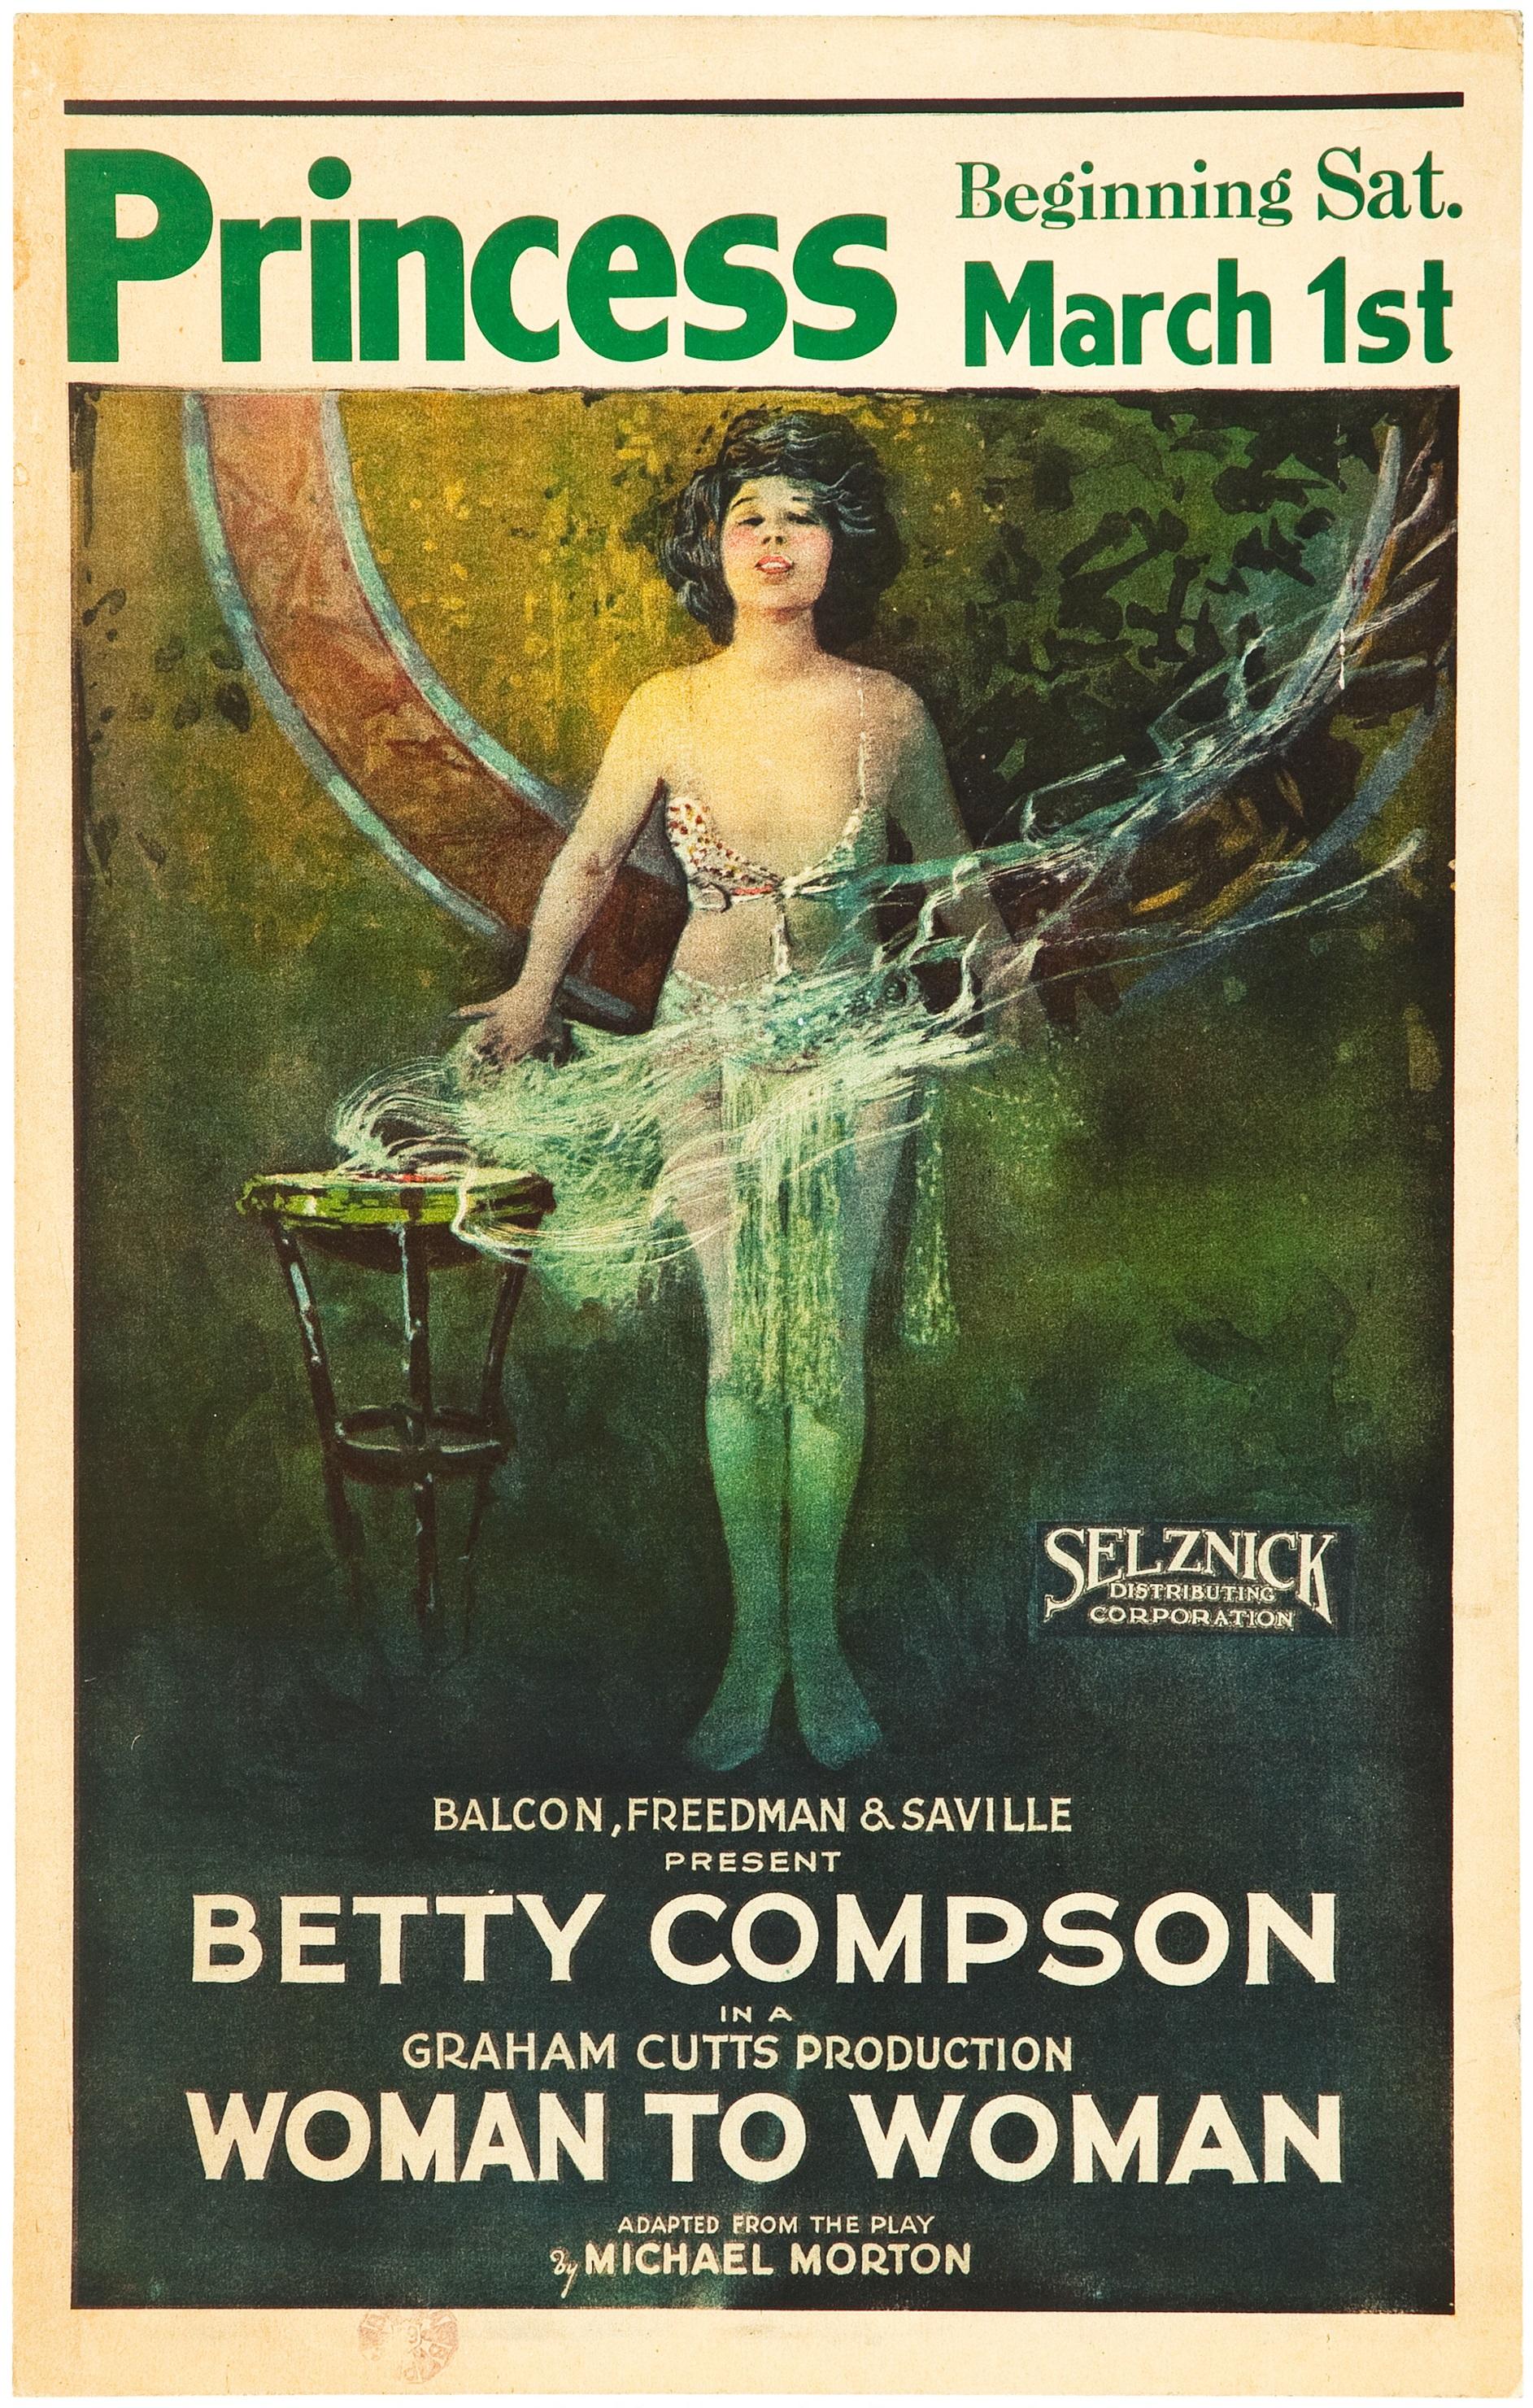 Woman to Woman (1923, asst dir. Alfred Hitchcock) US window card